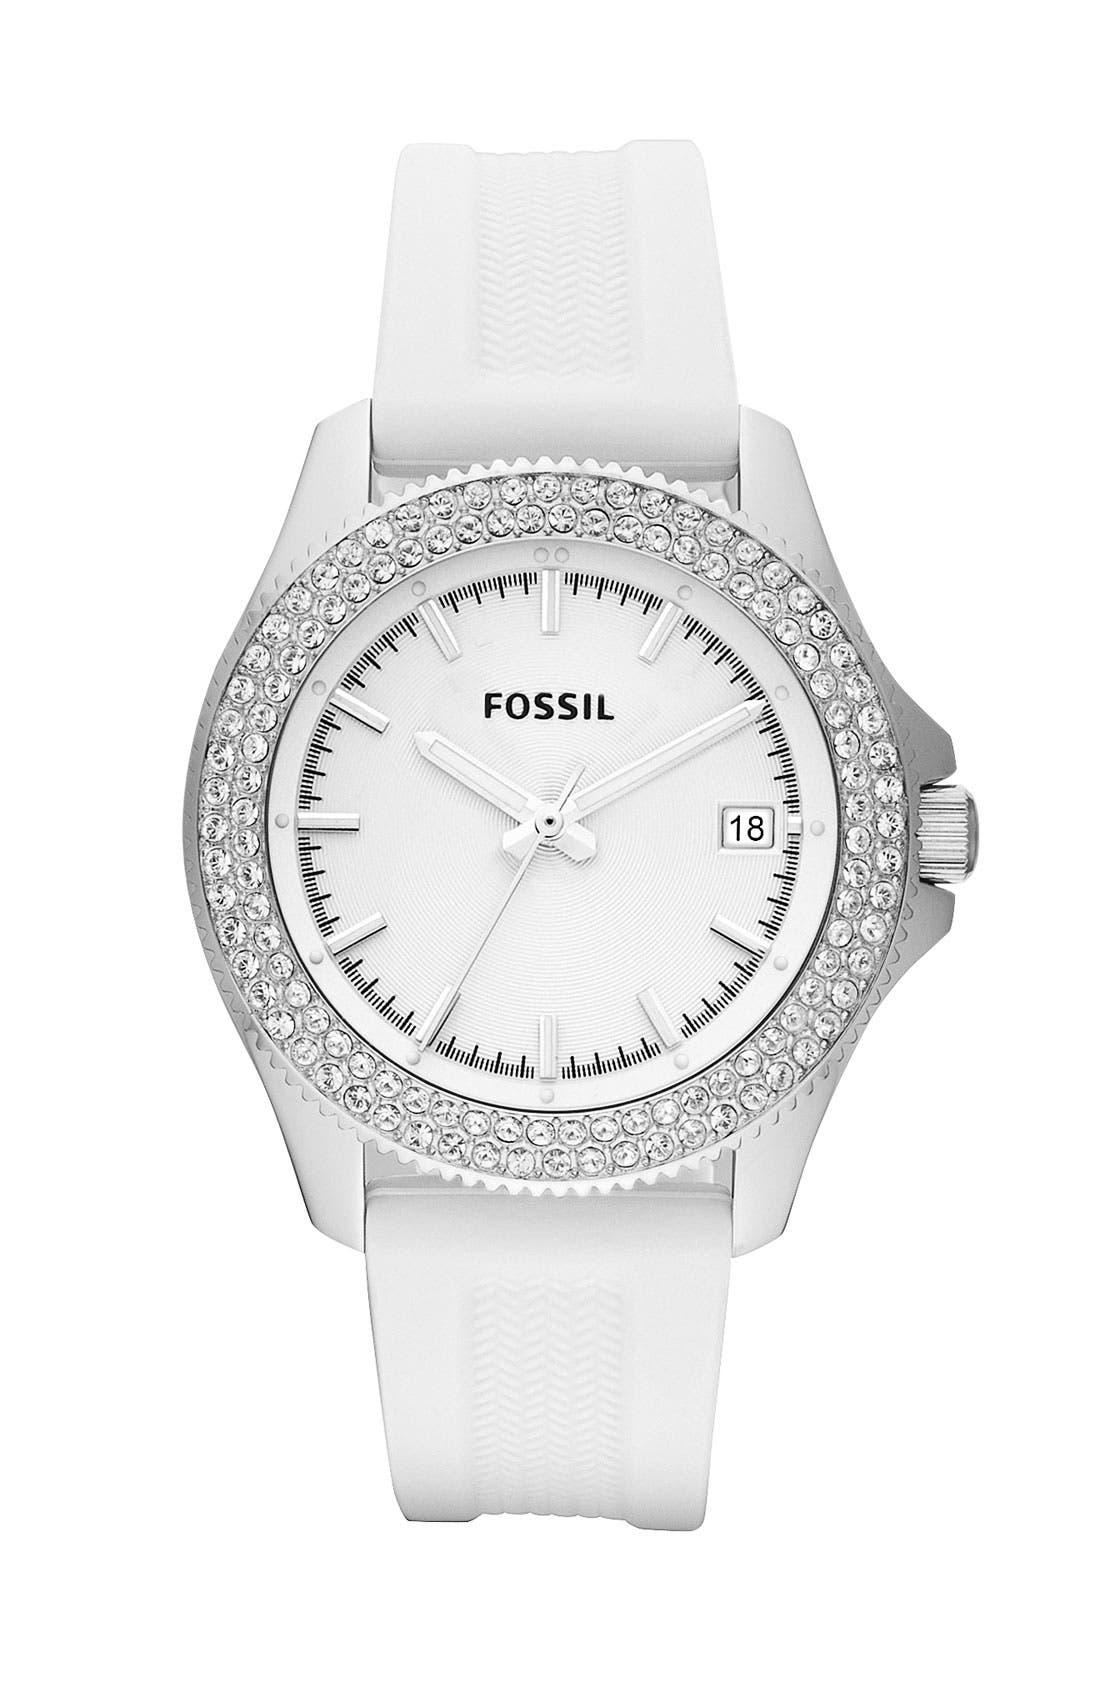 Main Image - Fossil 'Retro Traveler' Crystal Bezel Watch, 36mm